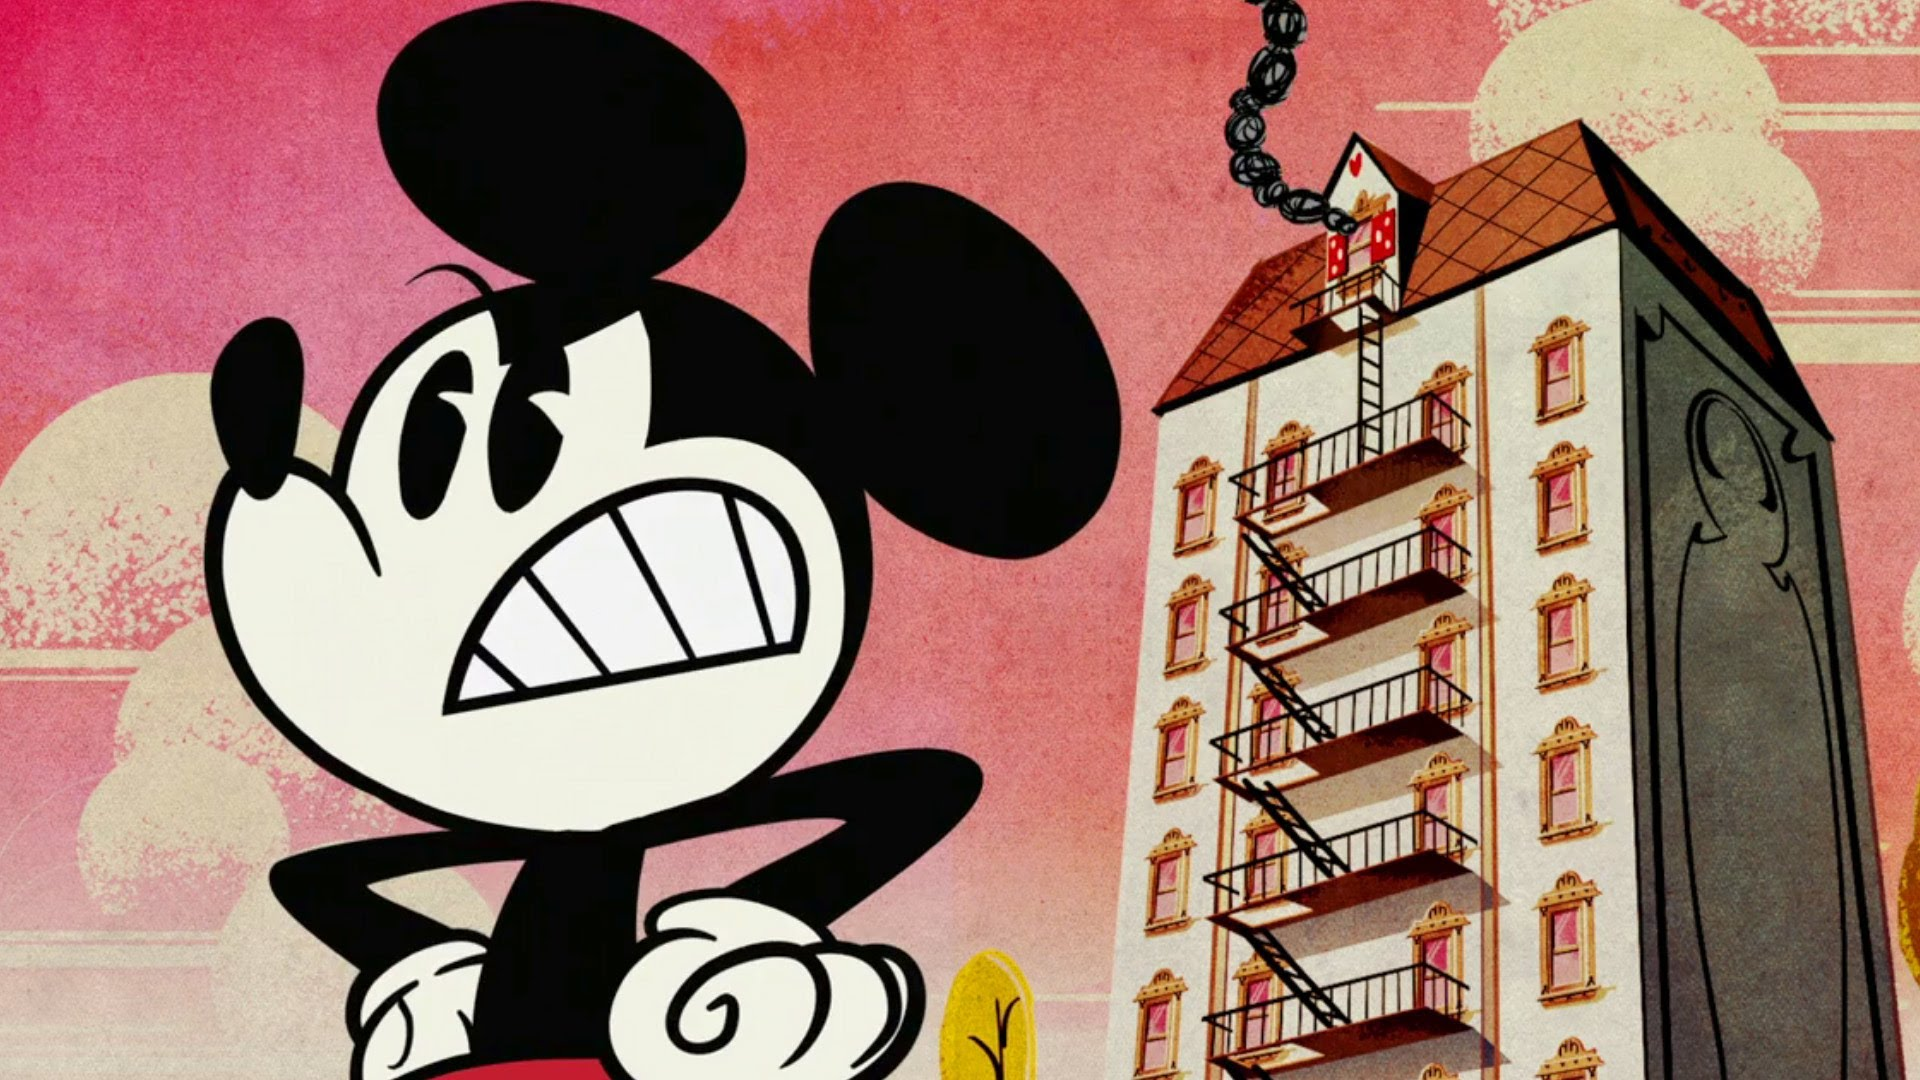 Fire Escape | A Mickey Mouse Cartoon